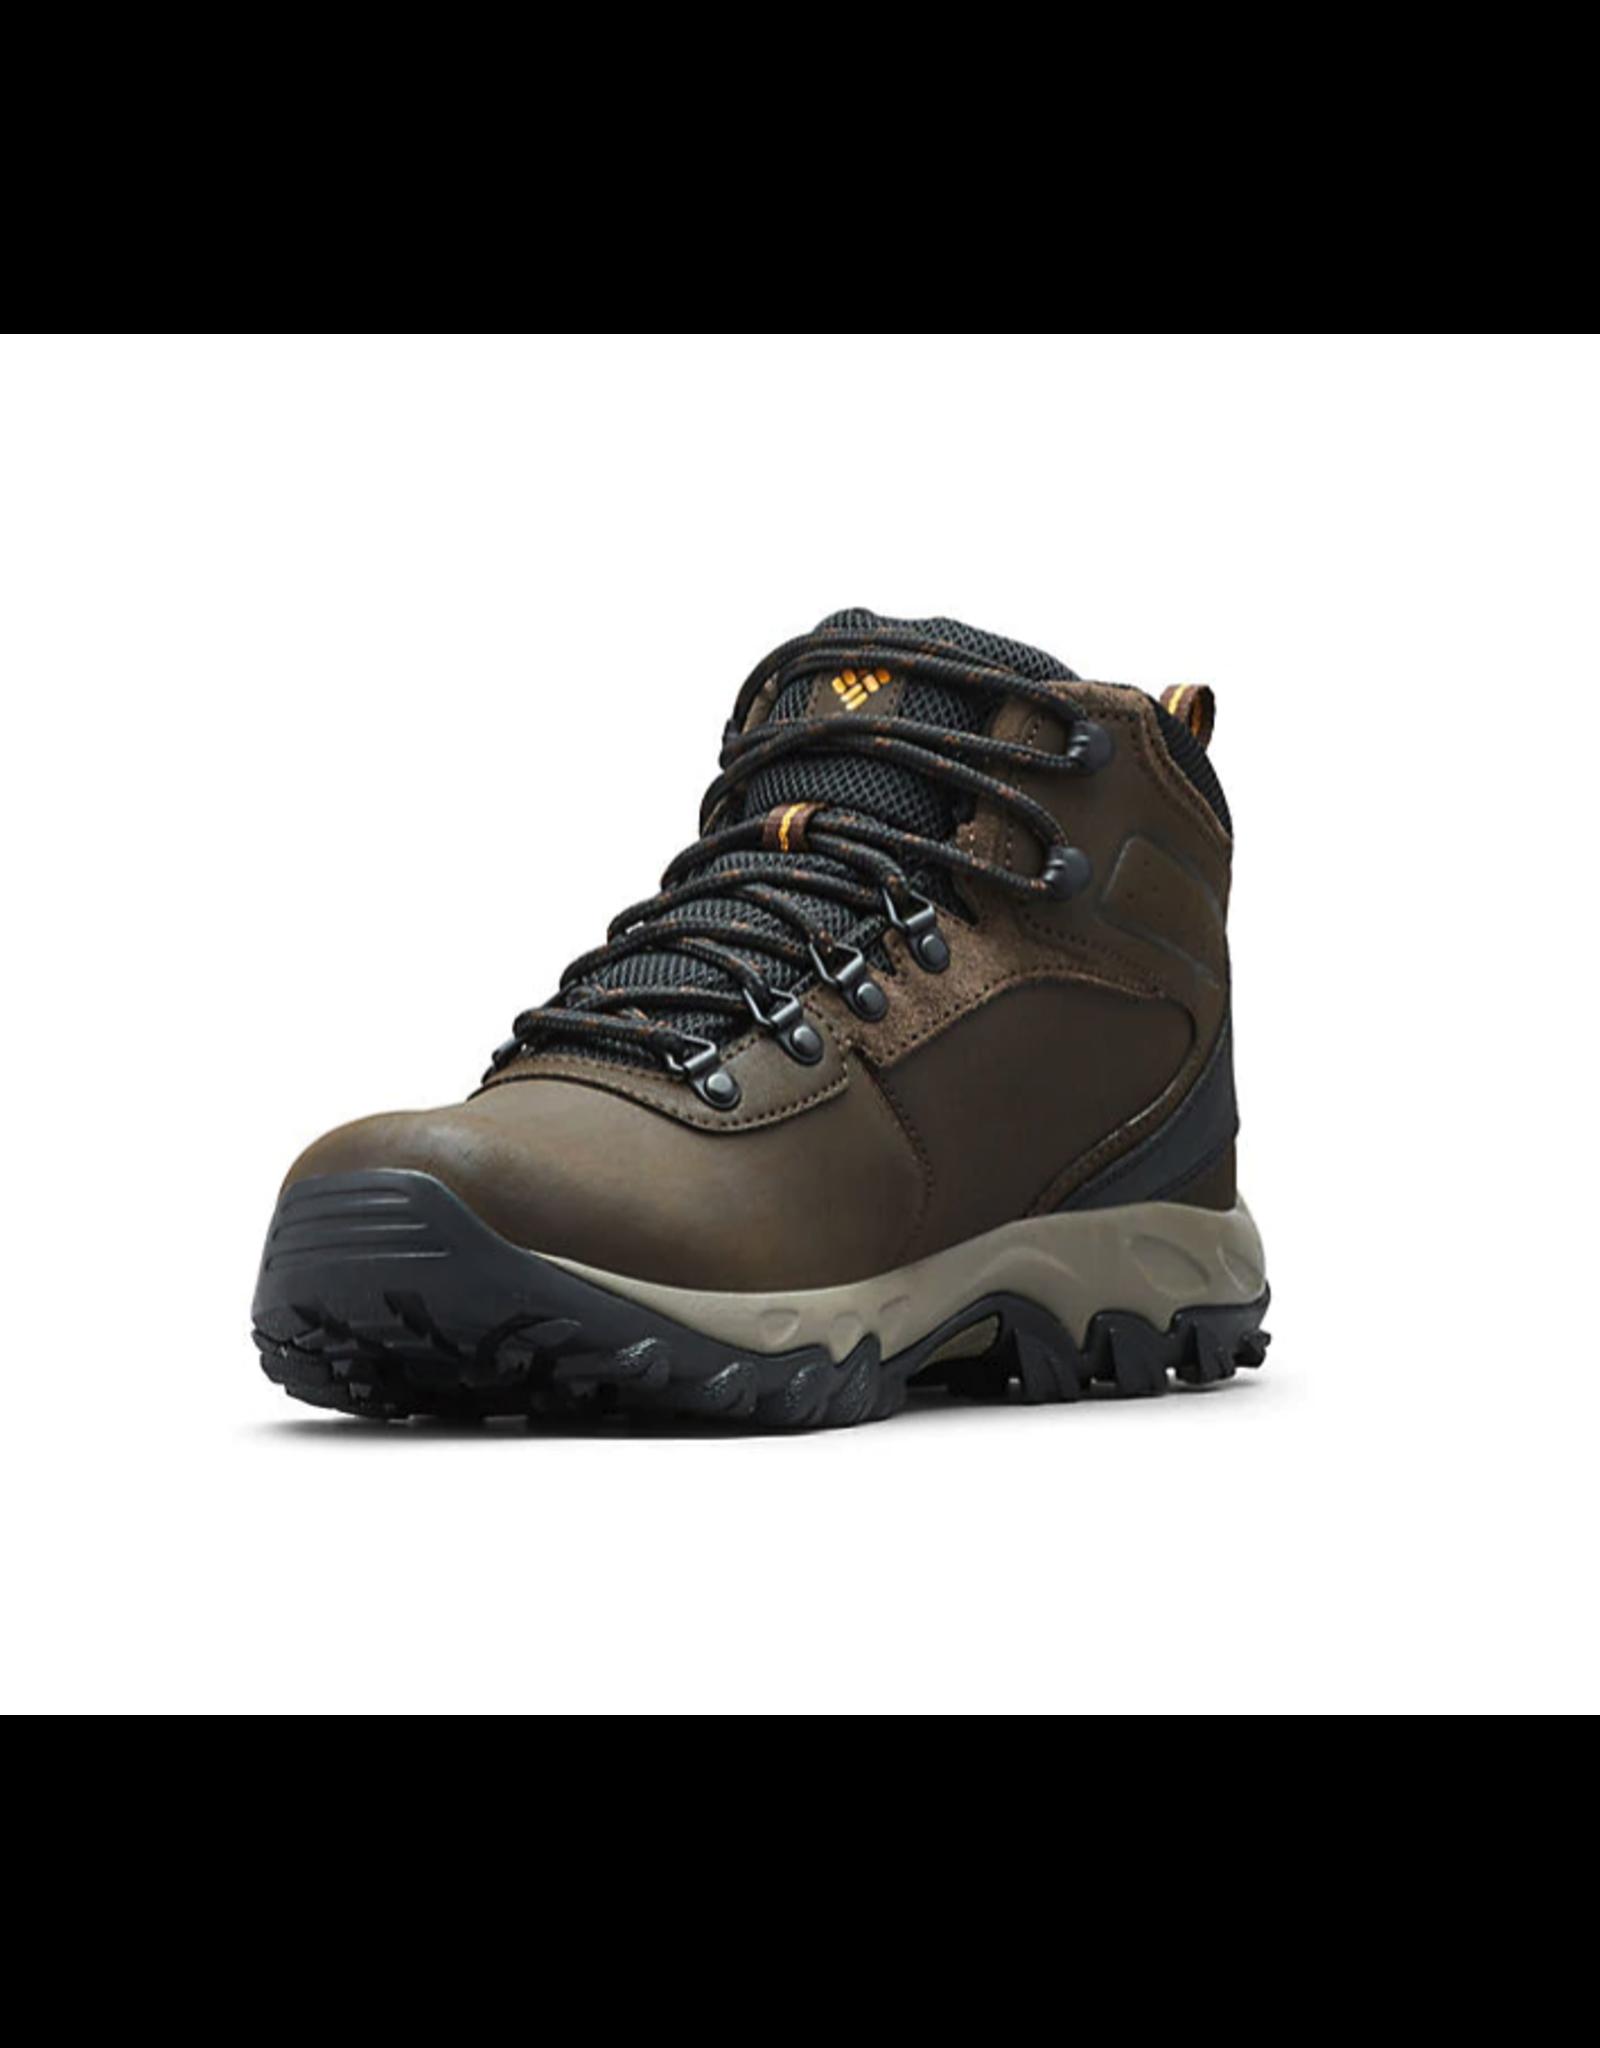 Columbia Columbia - Men's Newton Ridge Plus II Waterproof Hiking Boots